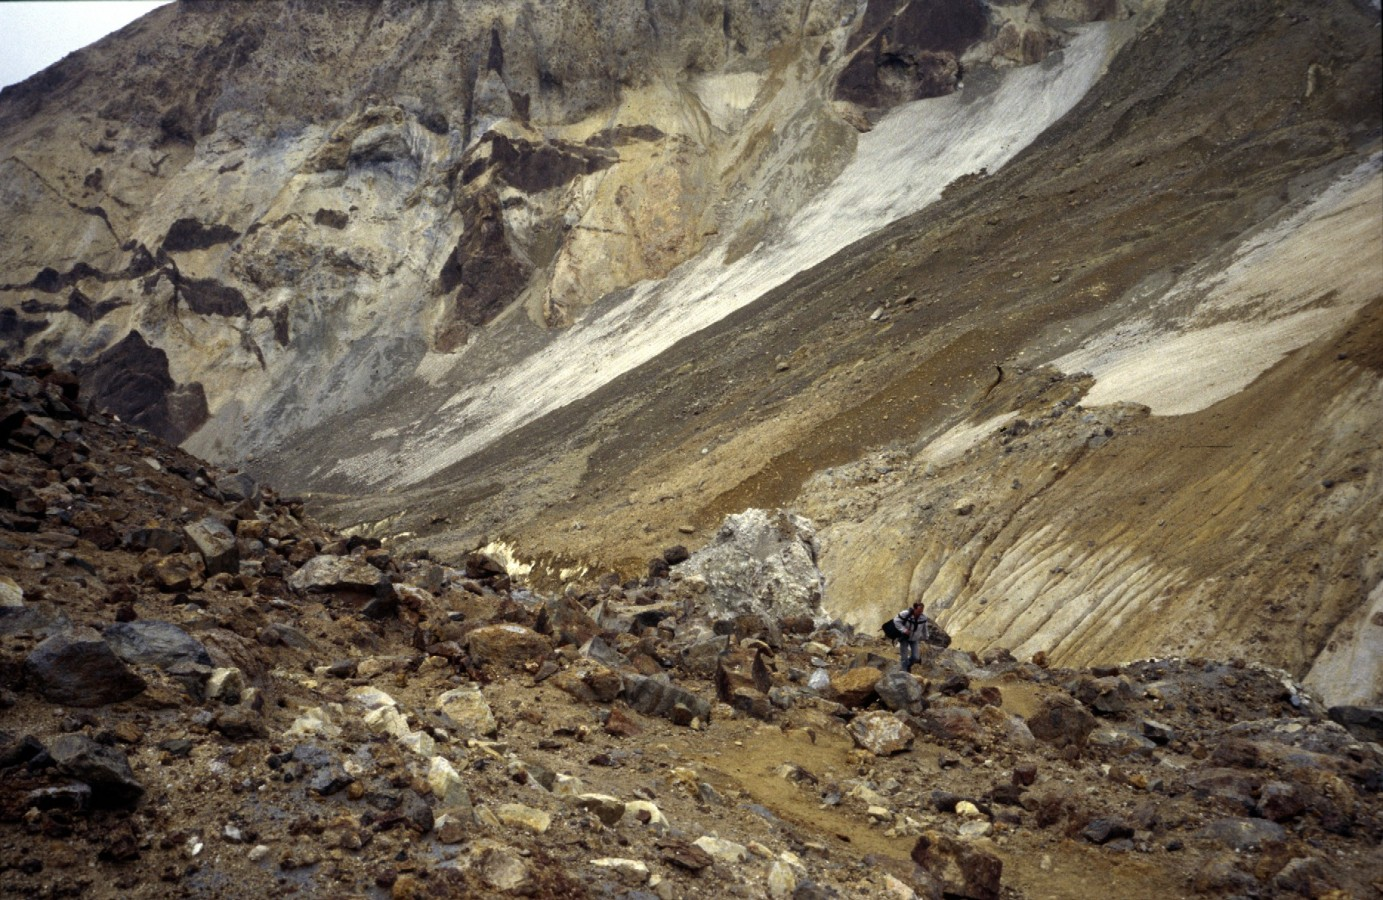 Climbing the active Mutnovki vulcano, Kamshatka